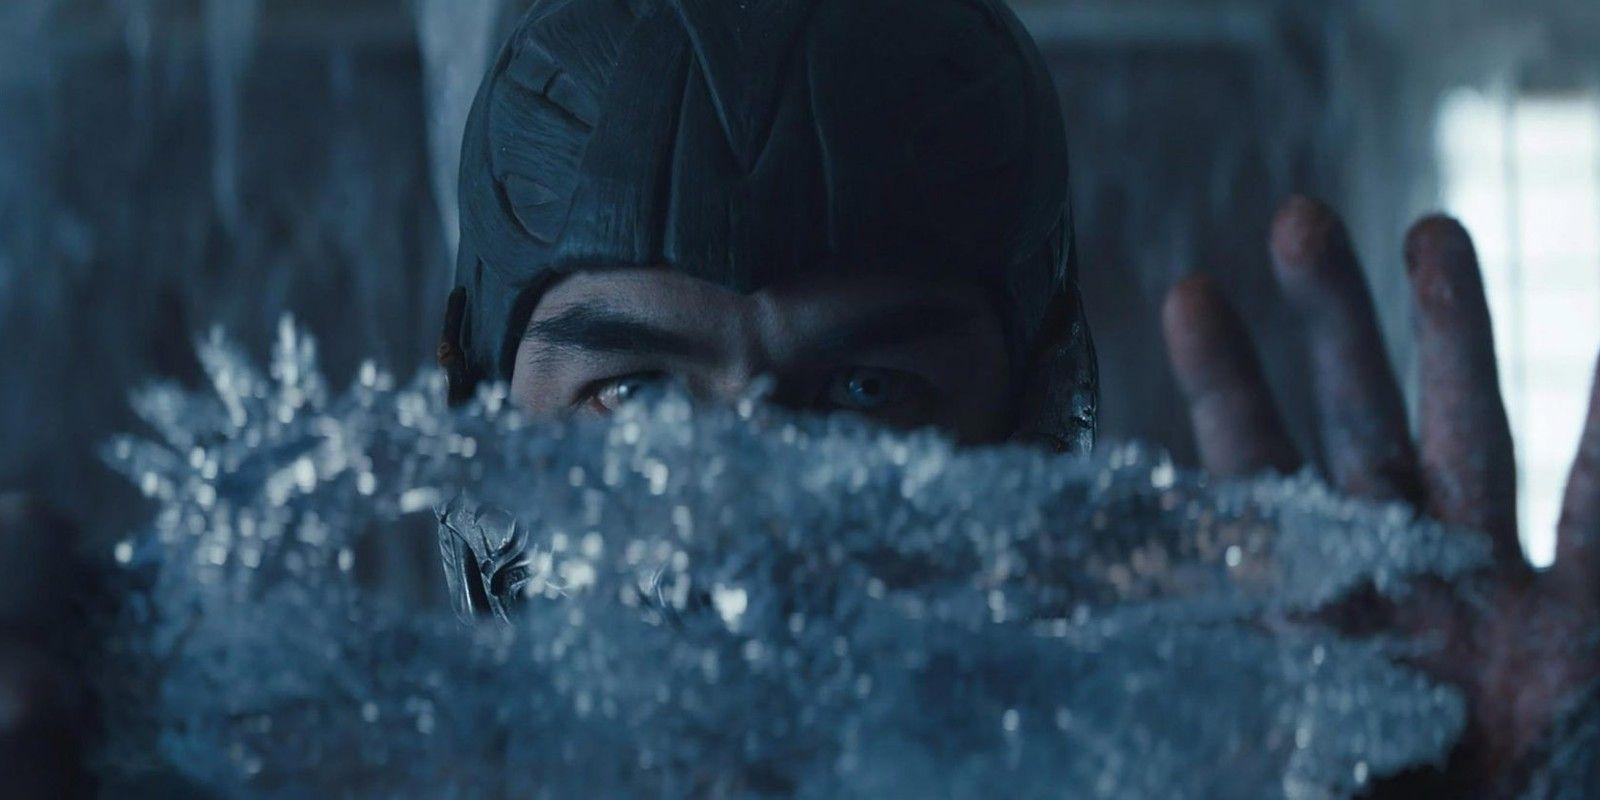 Mortal Kombat Movie Focuses On Scorpion, Sub-Zero Rivalry